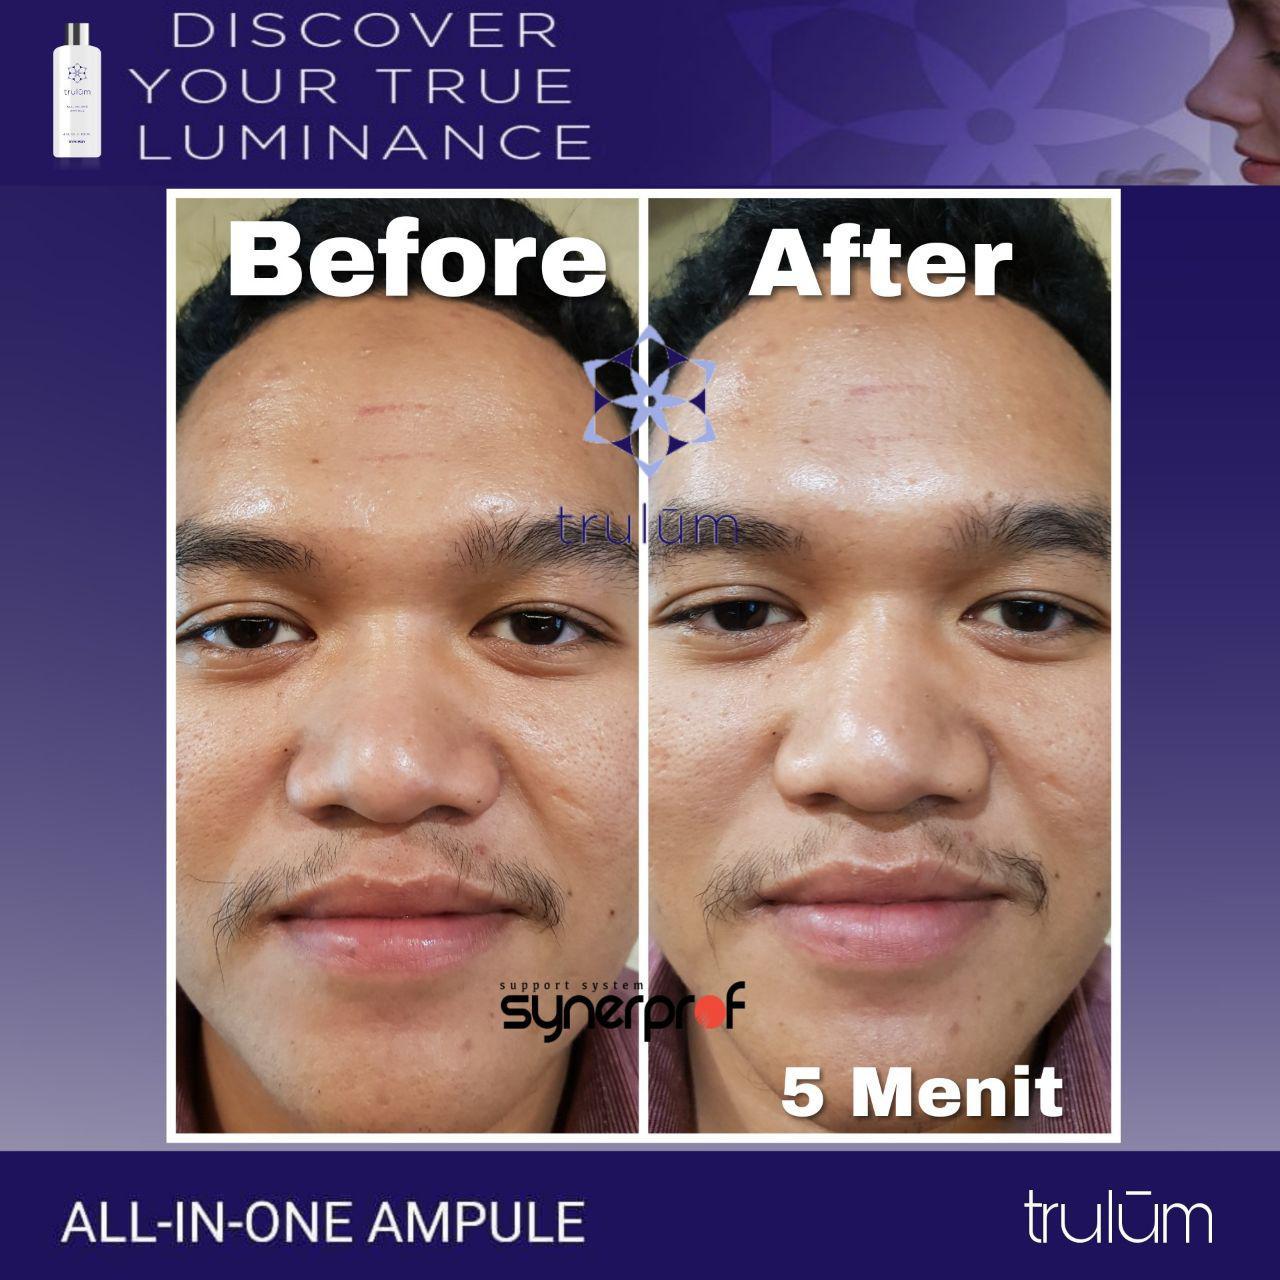 Klinik Kecantikan Trulum Skincare Synergy Di Kotawaringin Barat, Kalimantan Tengah WA: 08112338376